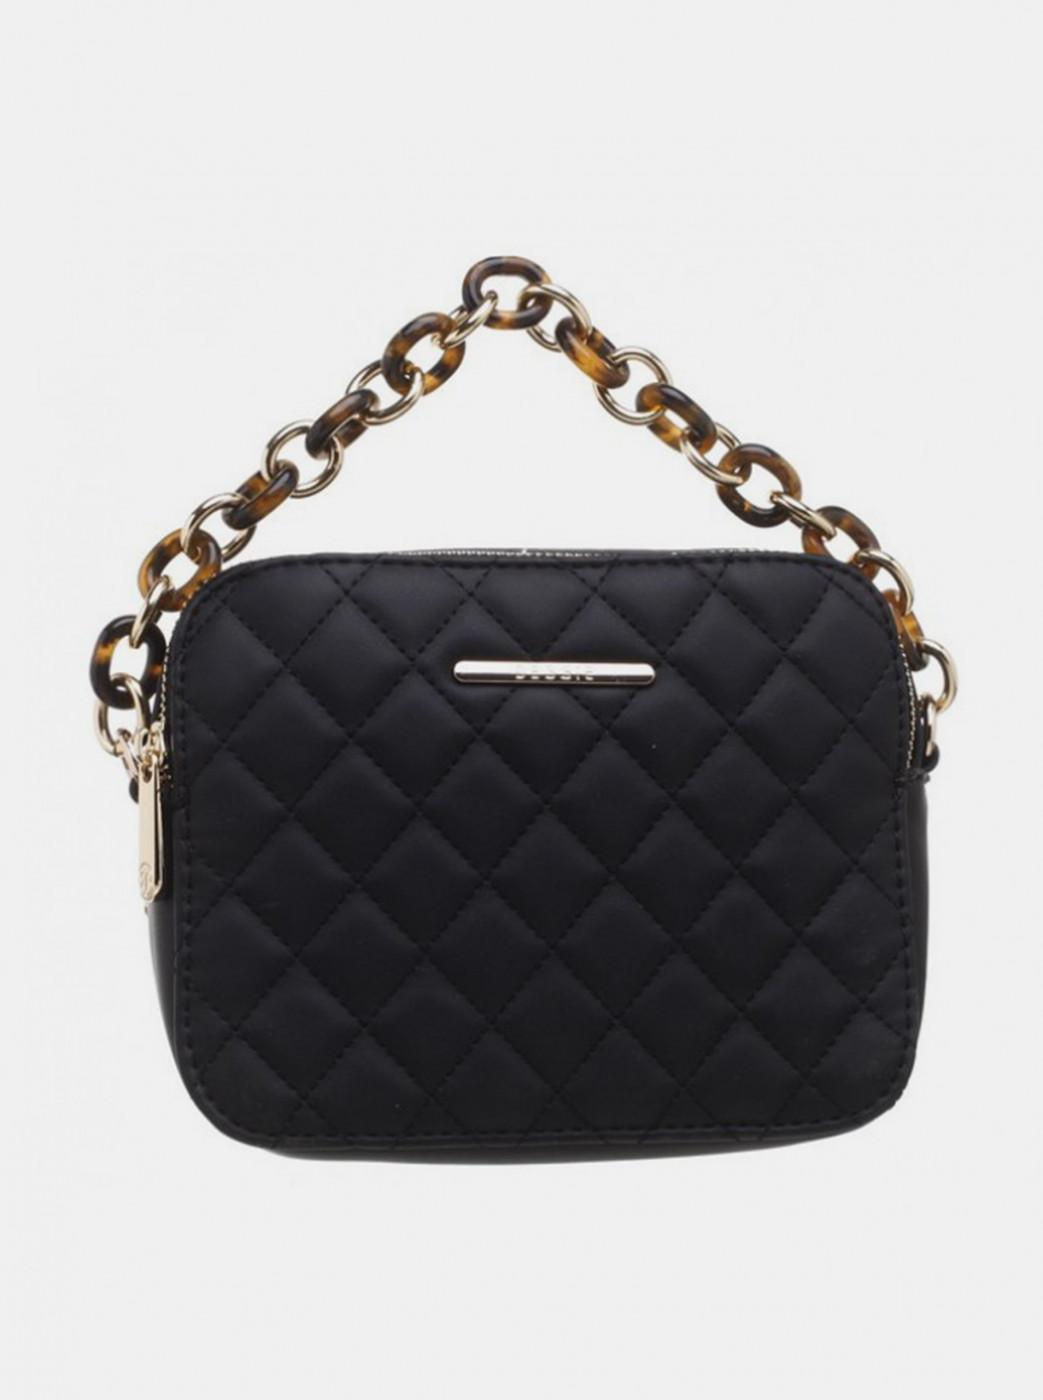 Bessie London Black Small Handbag